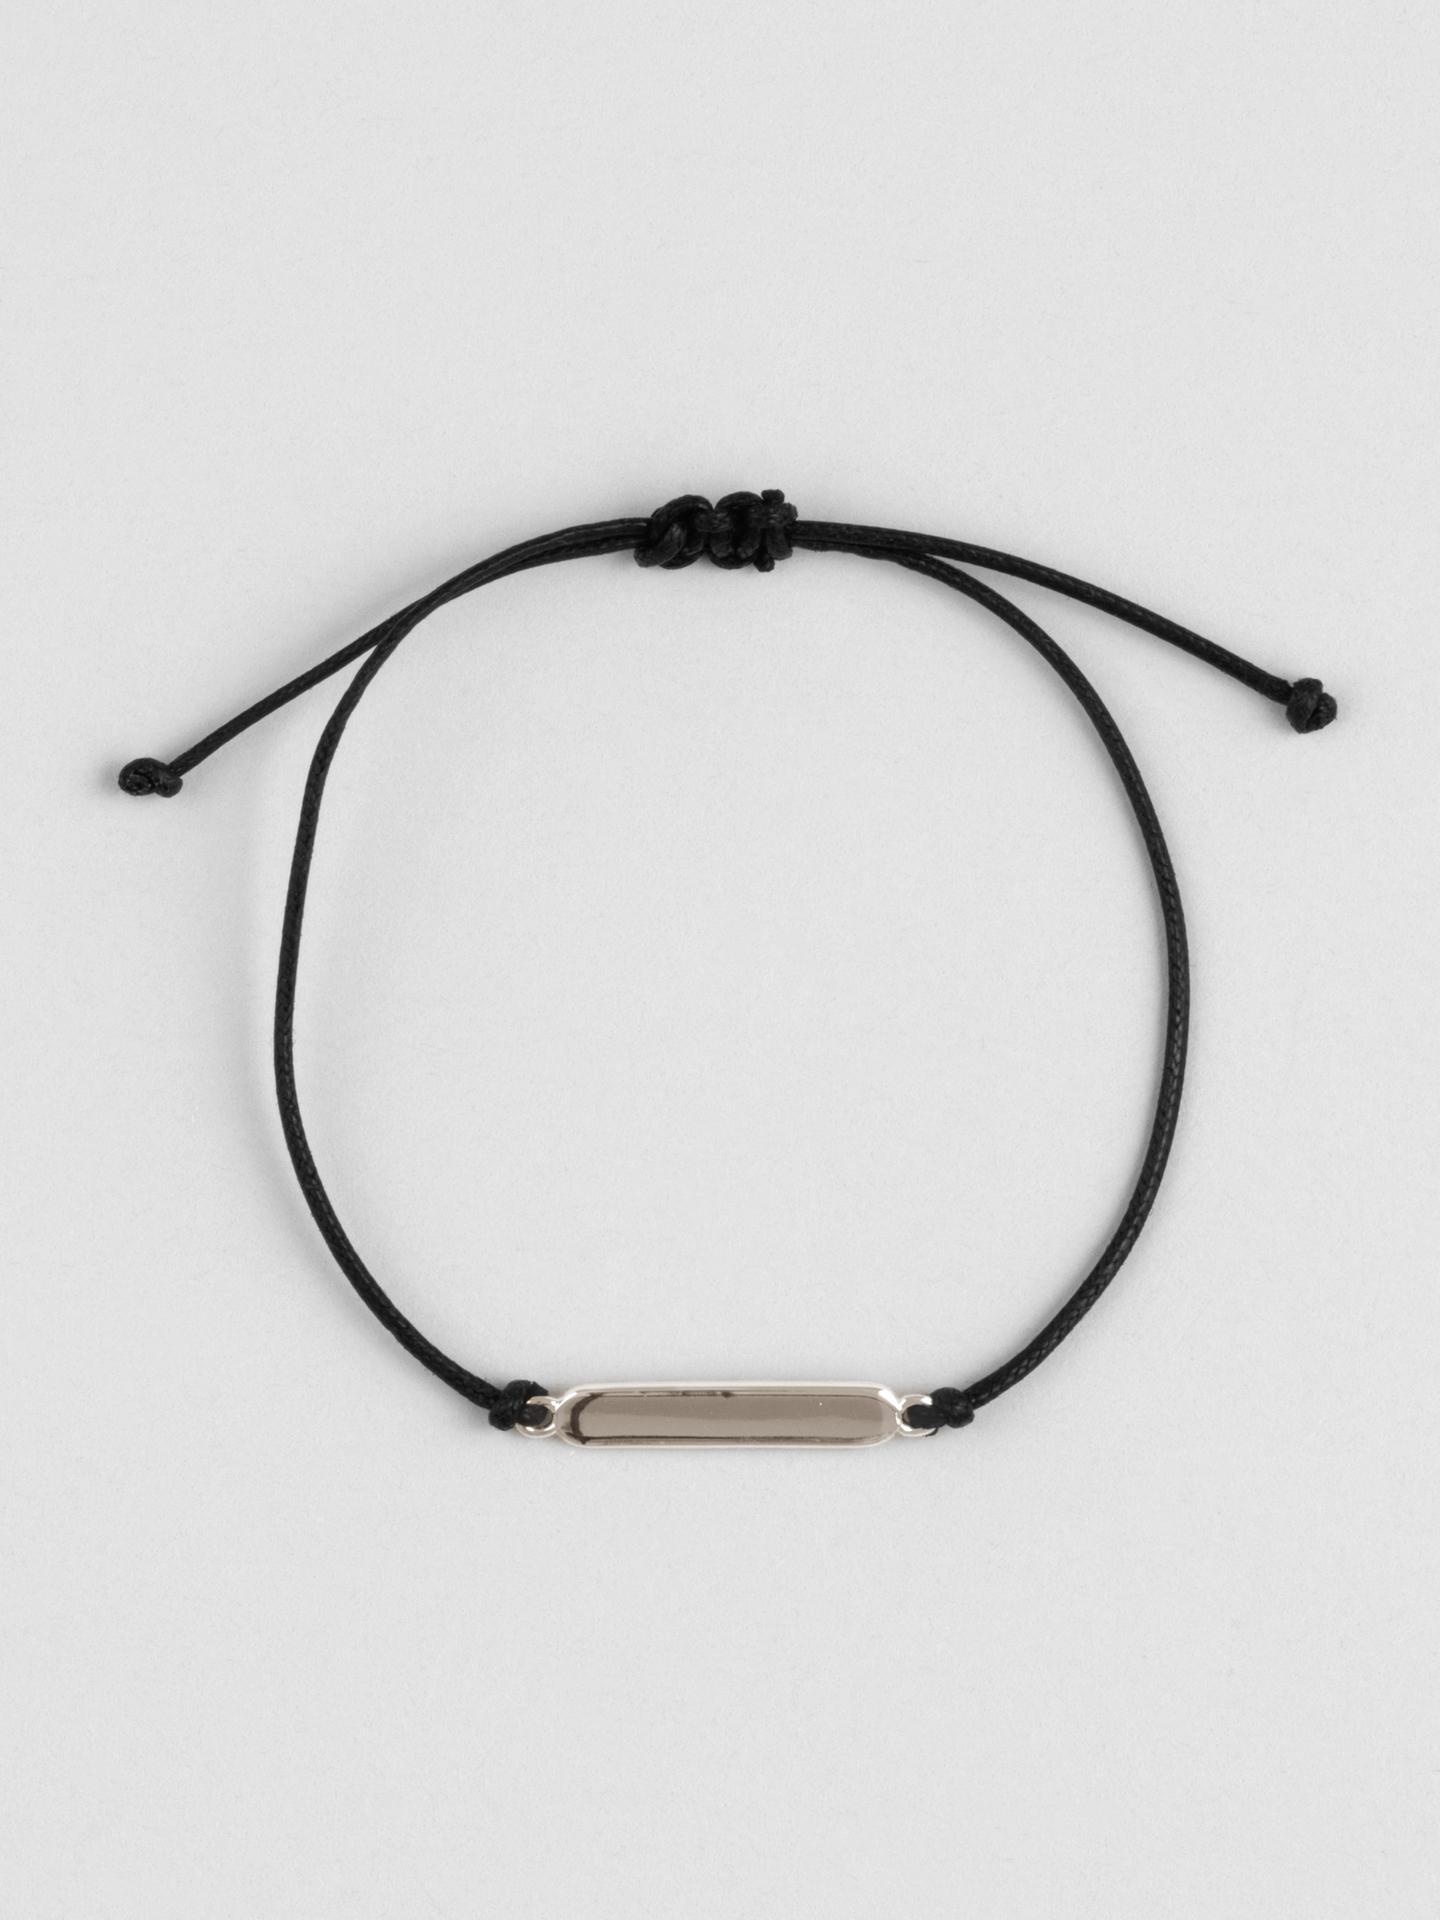 Engraving Braided Bracelet